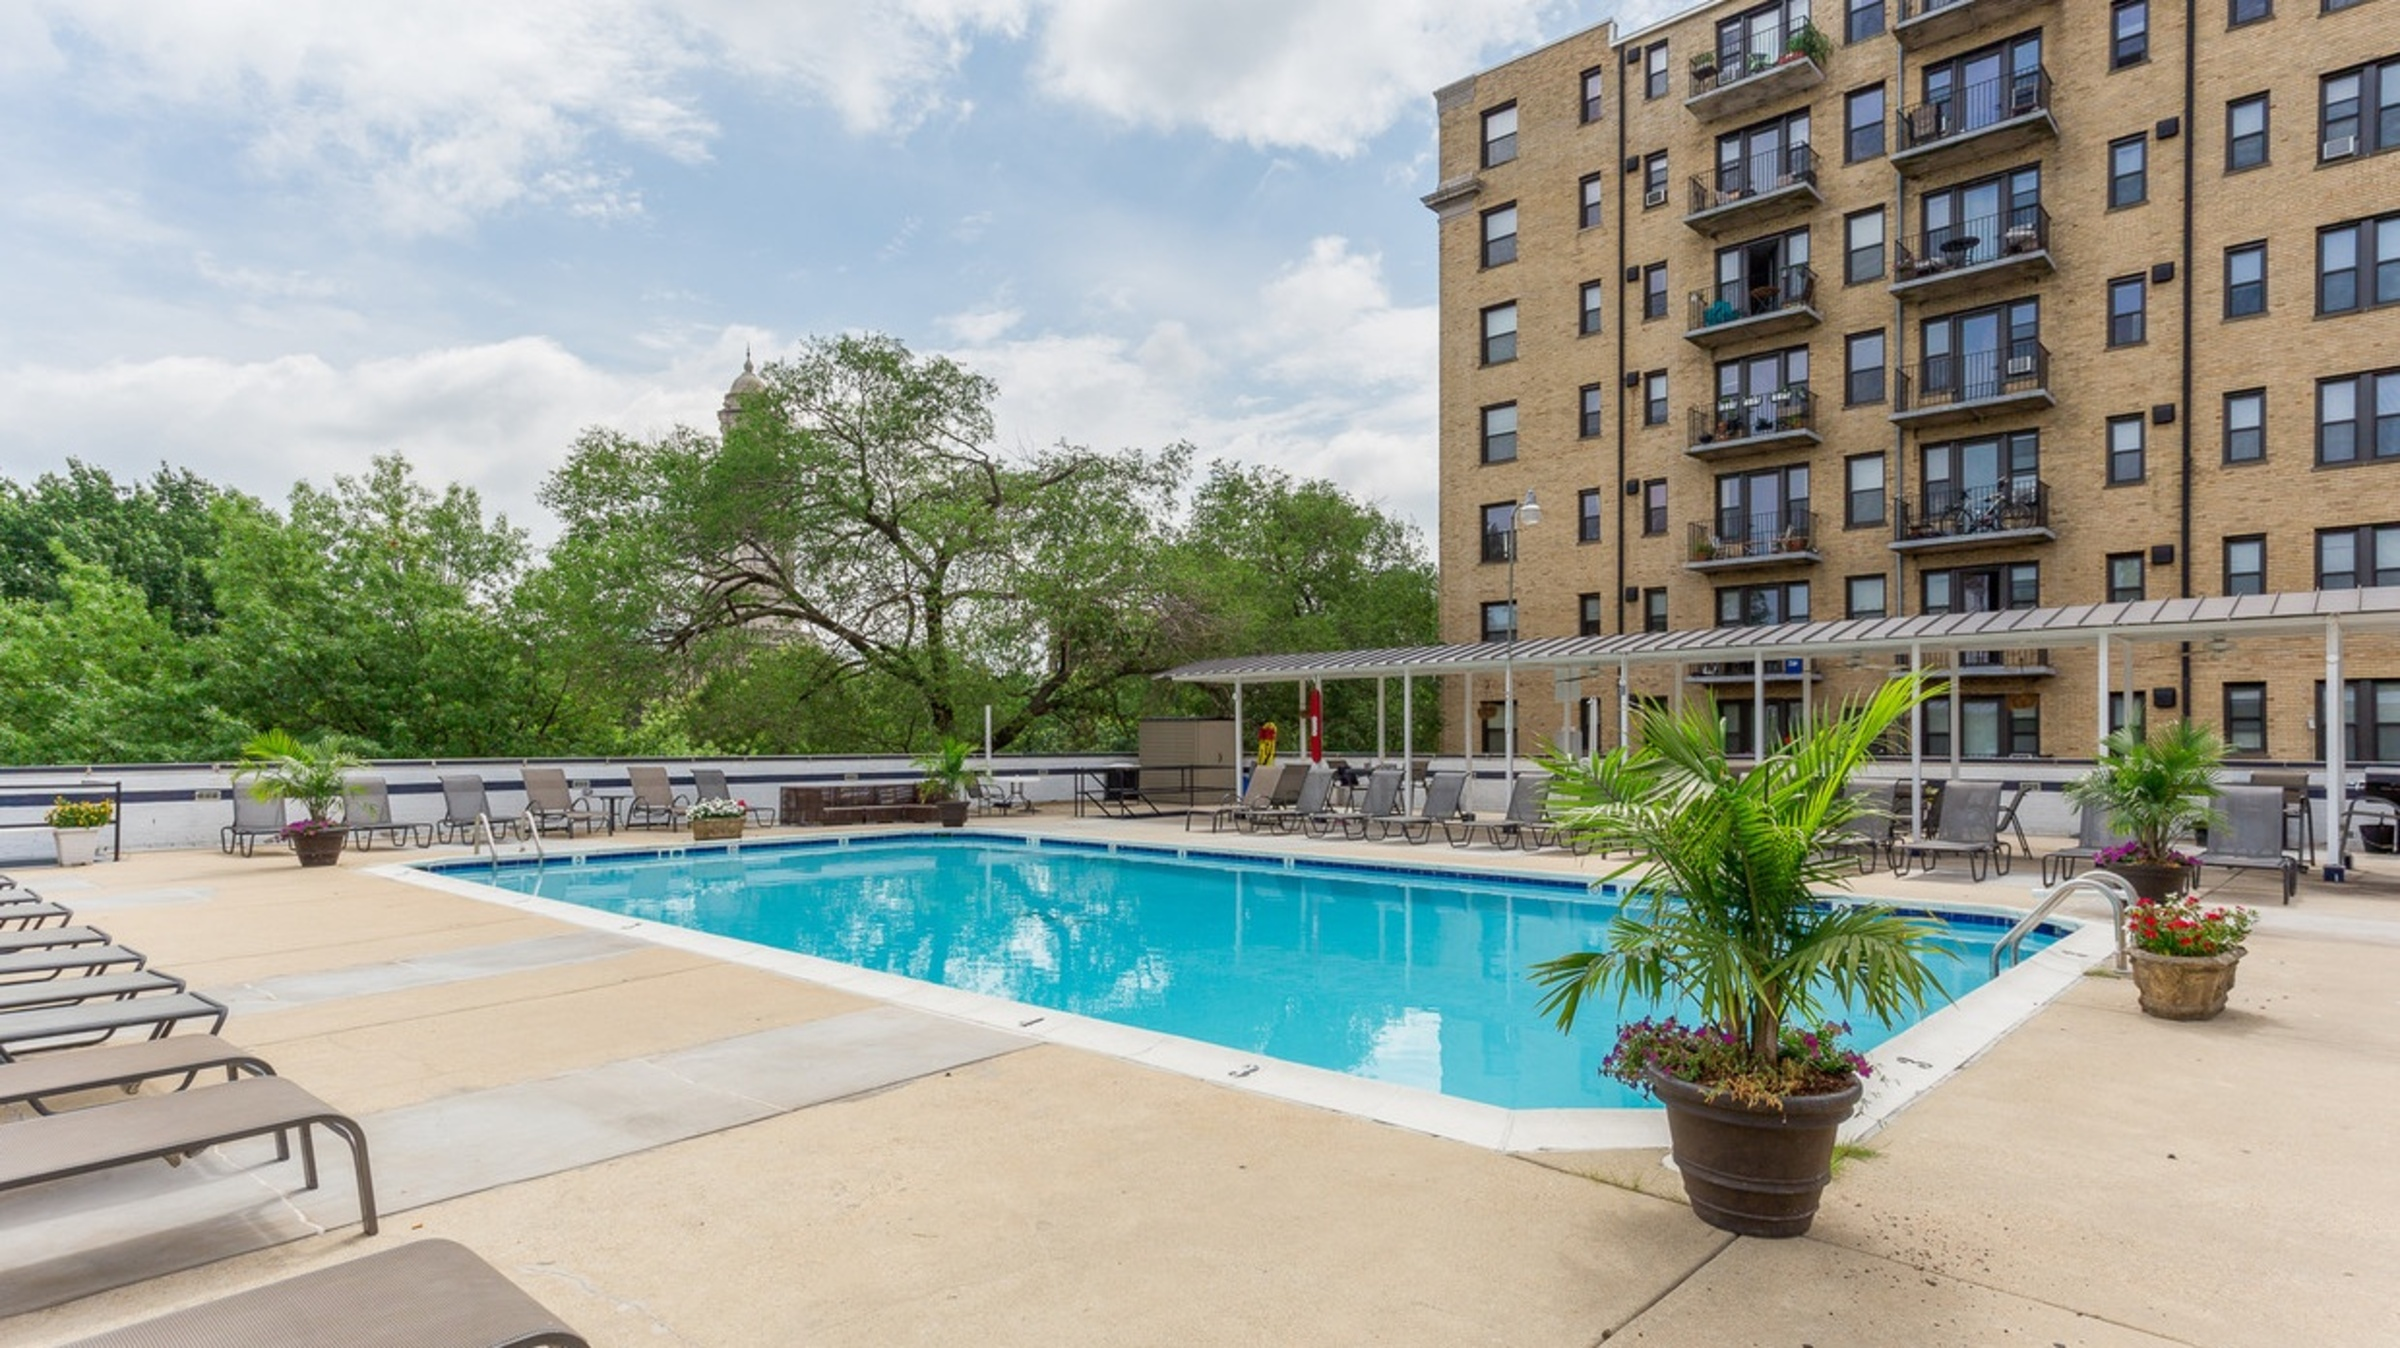 The Argonne 127